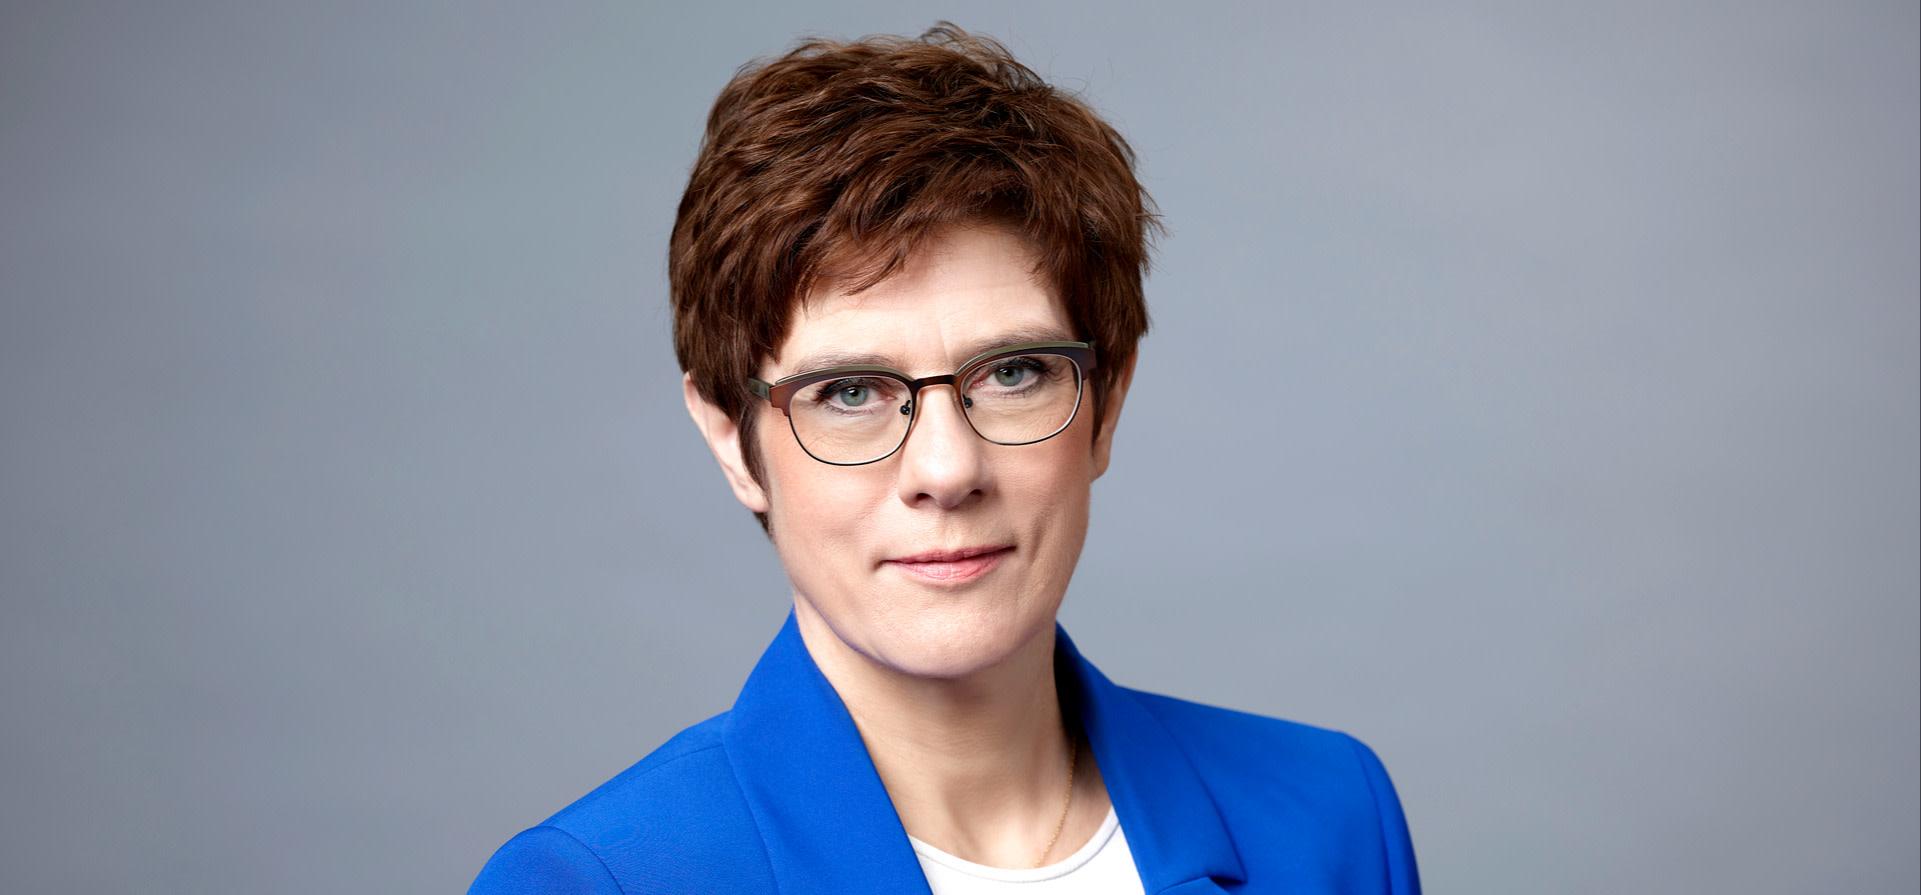 Foto: CDU / Laurence Chaperon